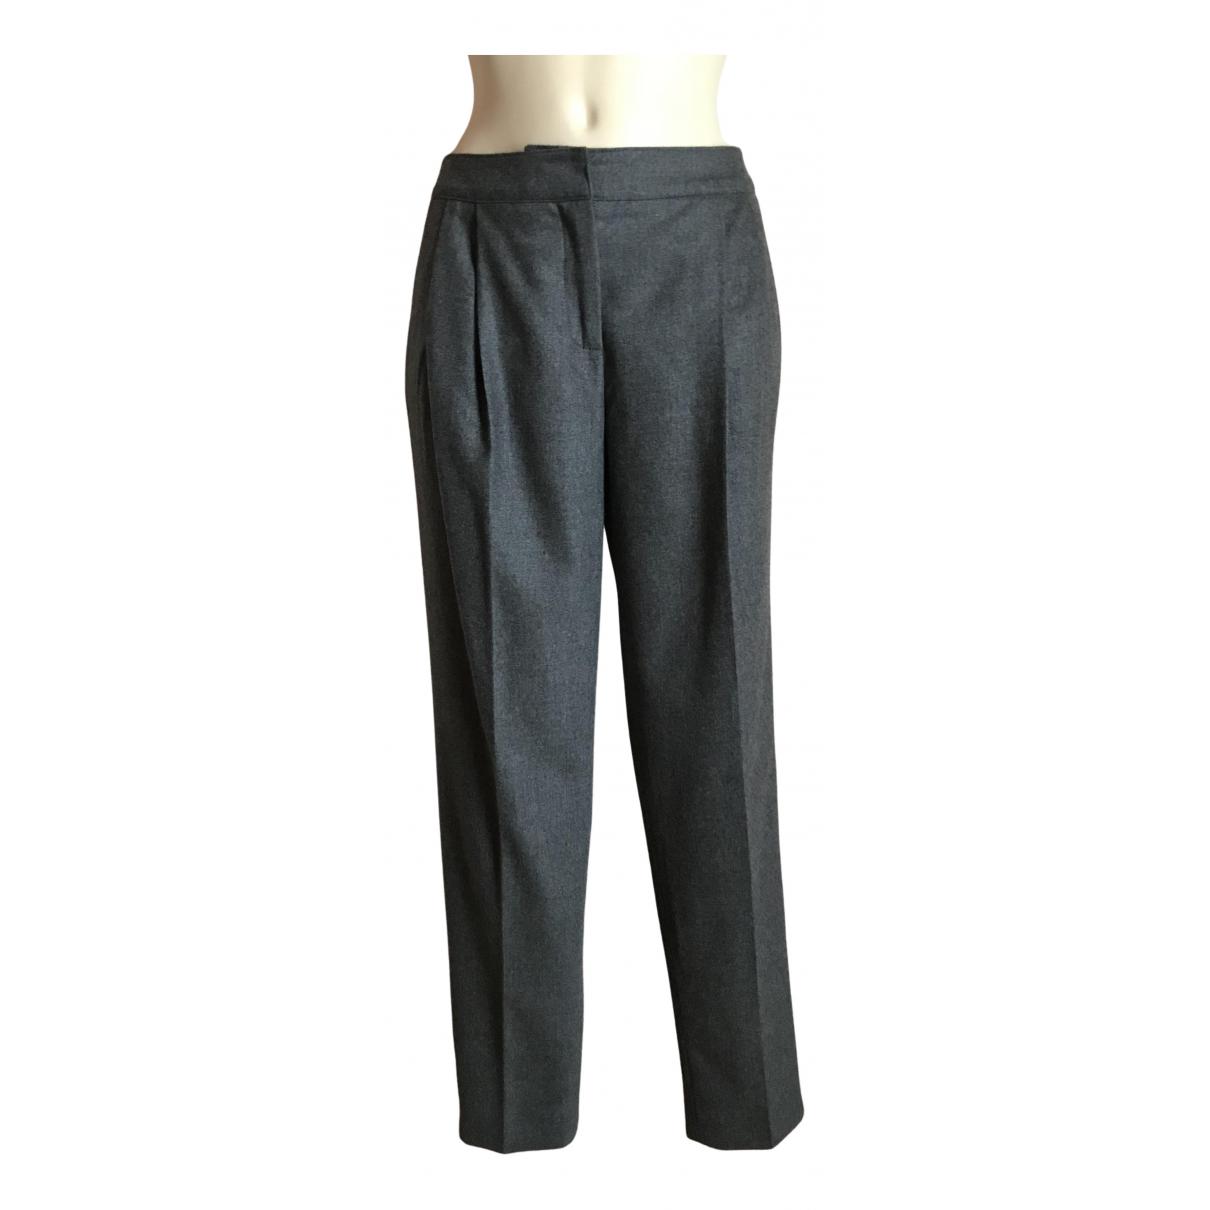 Burberry N Grey Wool Trousers for Women 42 IT